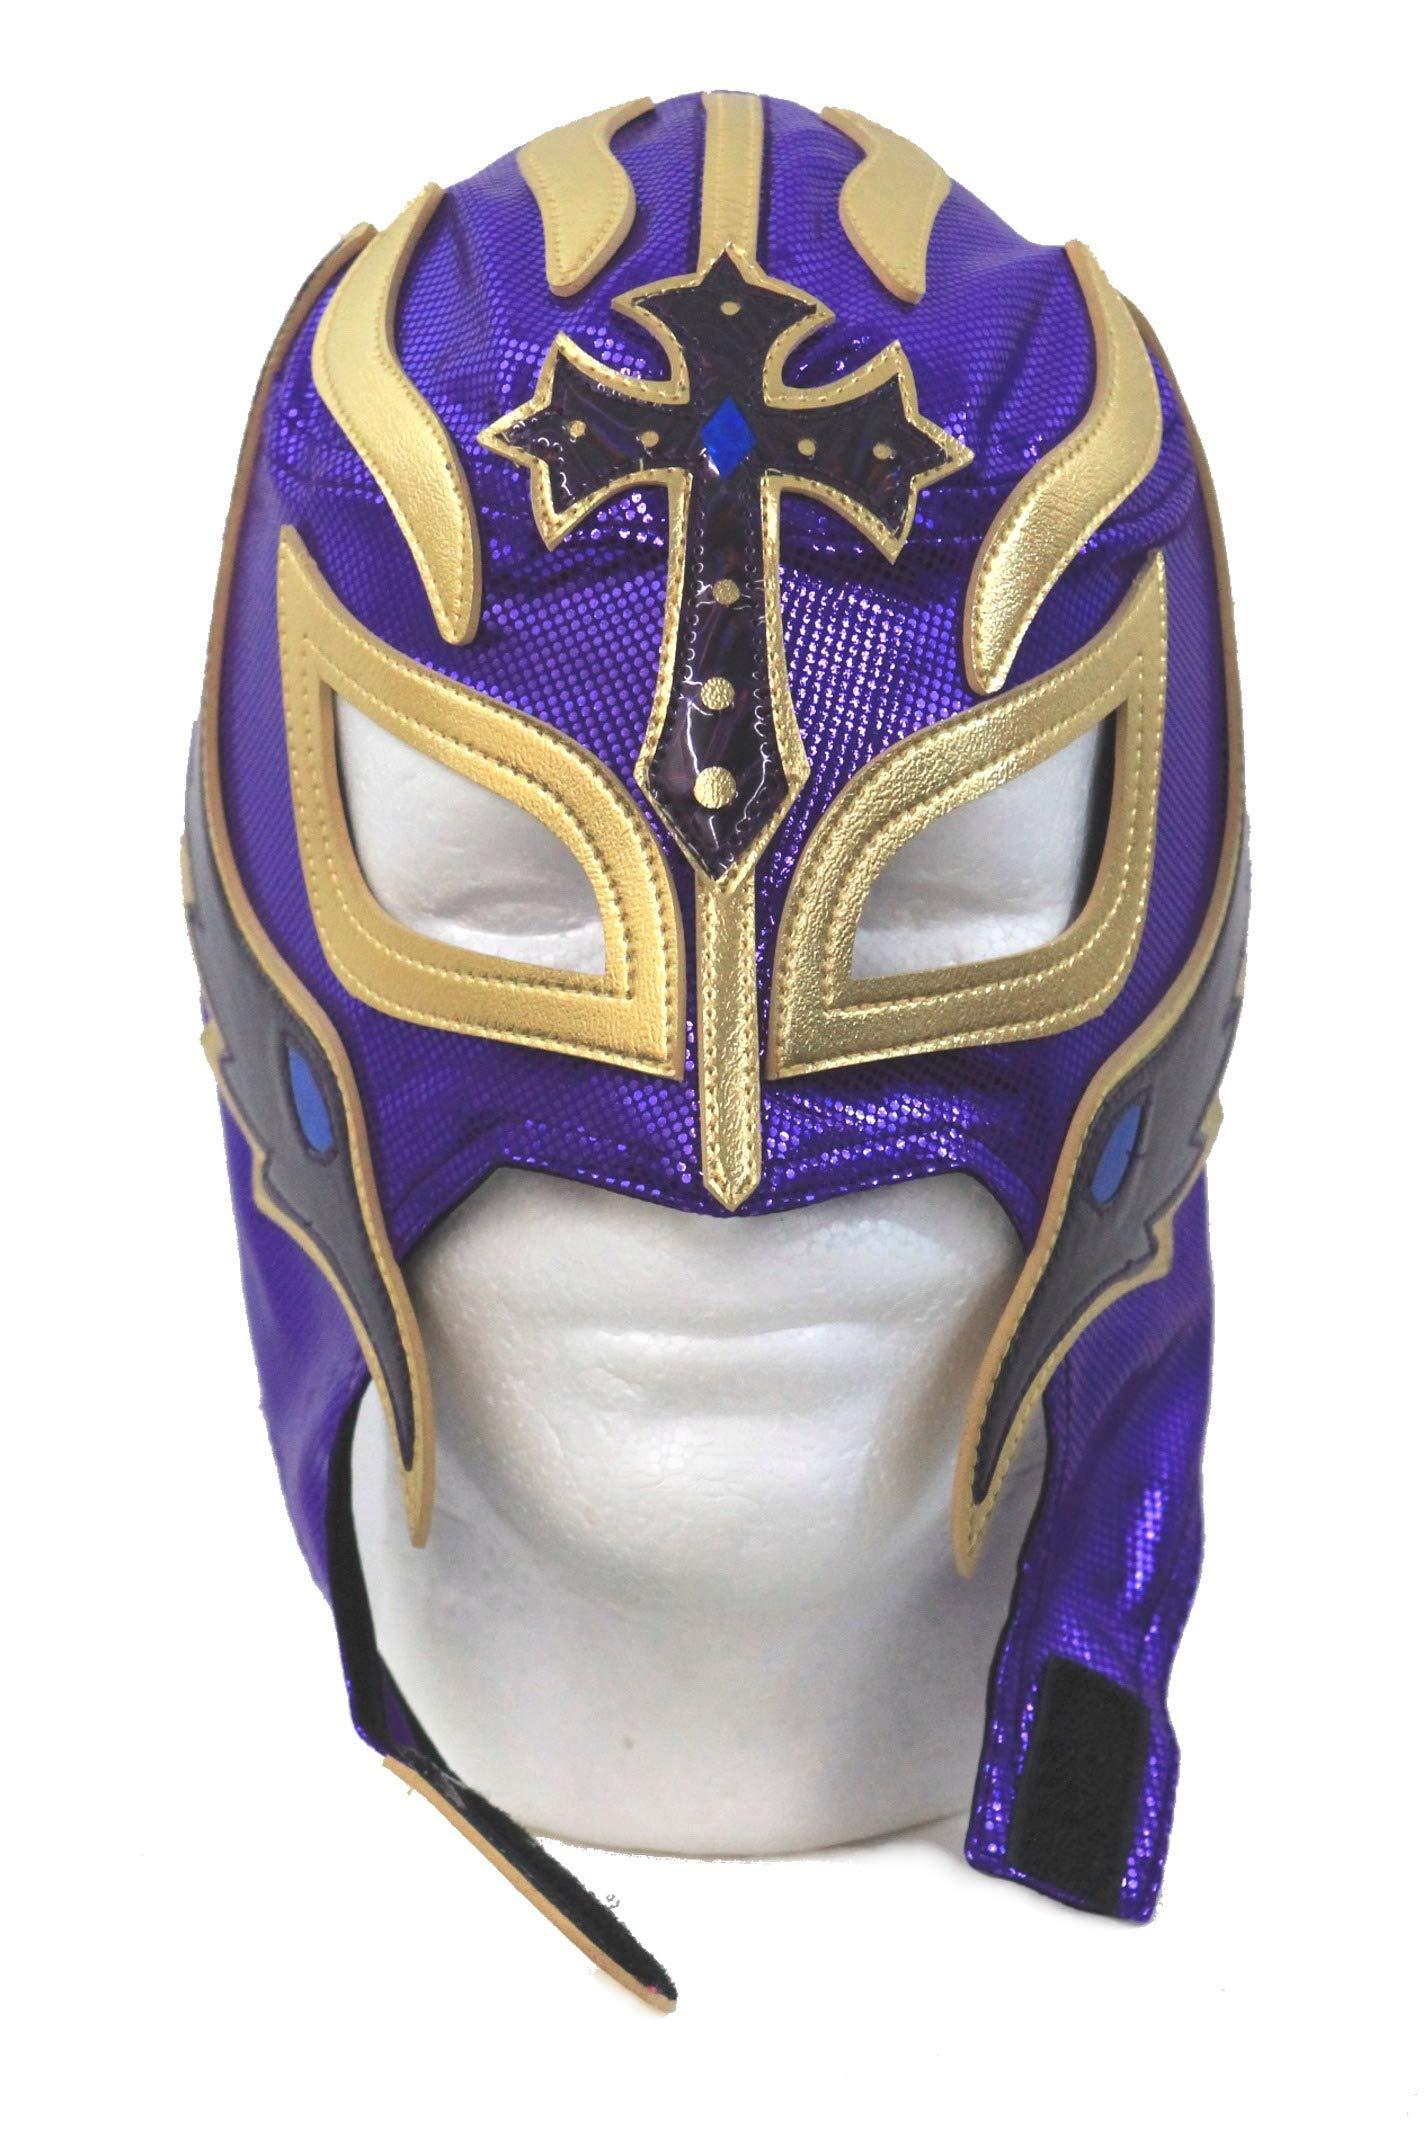 Leos Imports Rey Mysterio Lucha Libre Wrestling Mask (pro-grade) Costume Lycra -Purple